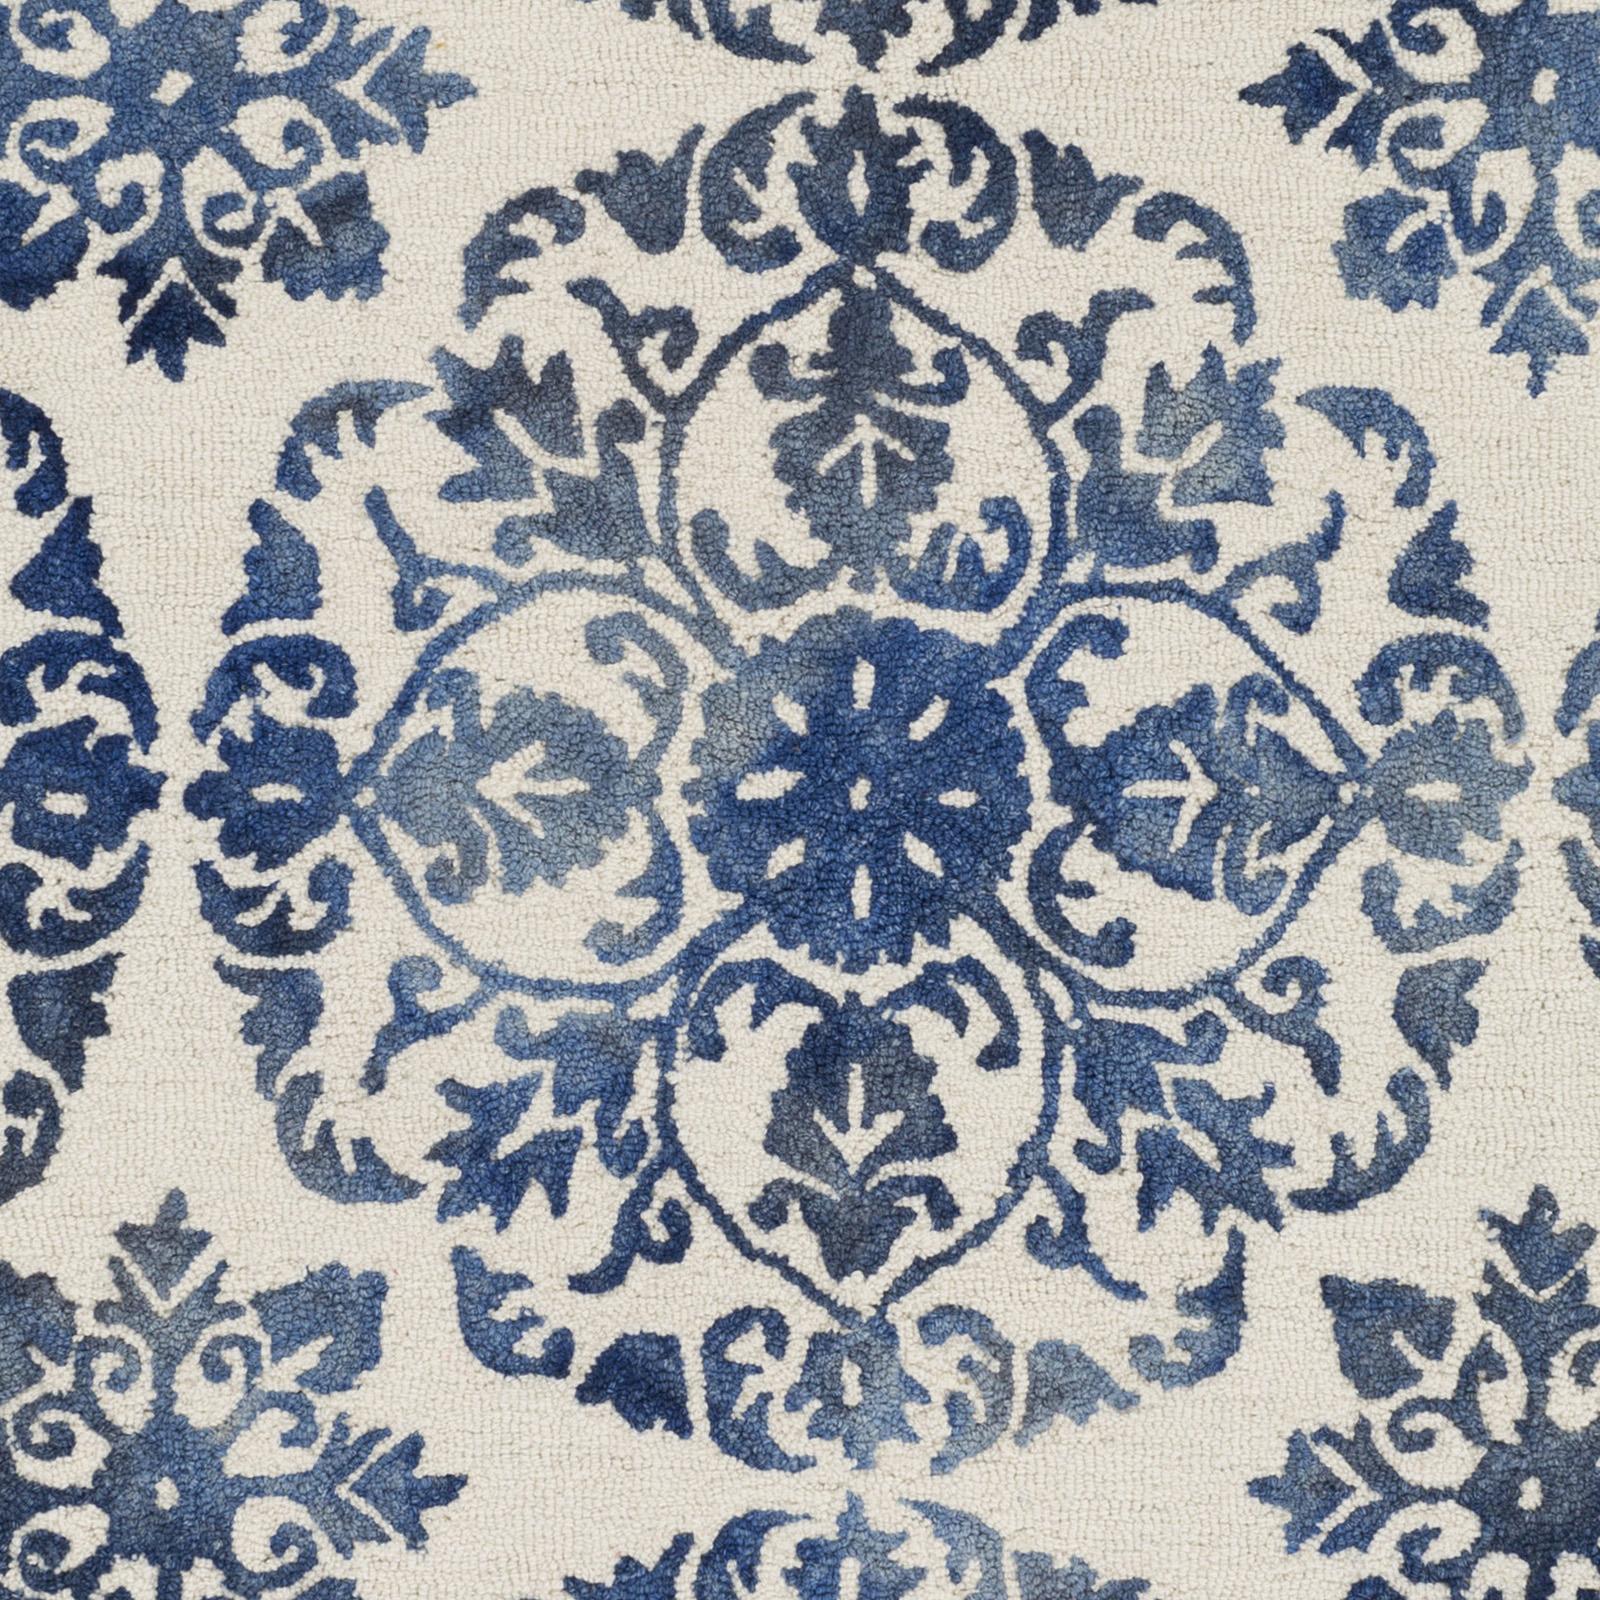 Chloe Rug From Organic By Artistic Weavers: Artistic Weavers ORGANIC AWOG-2296 Danielle Blue/Off-White Rug